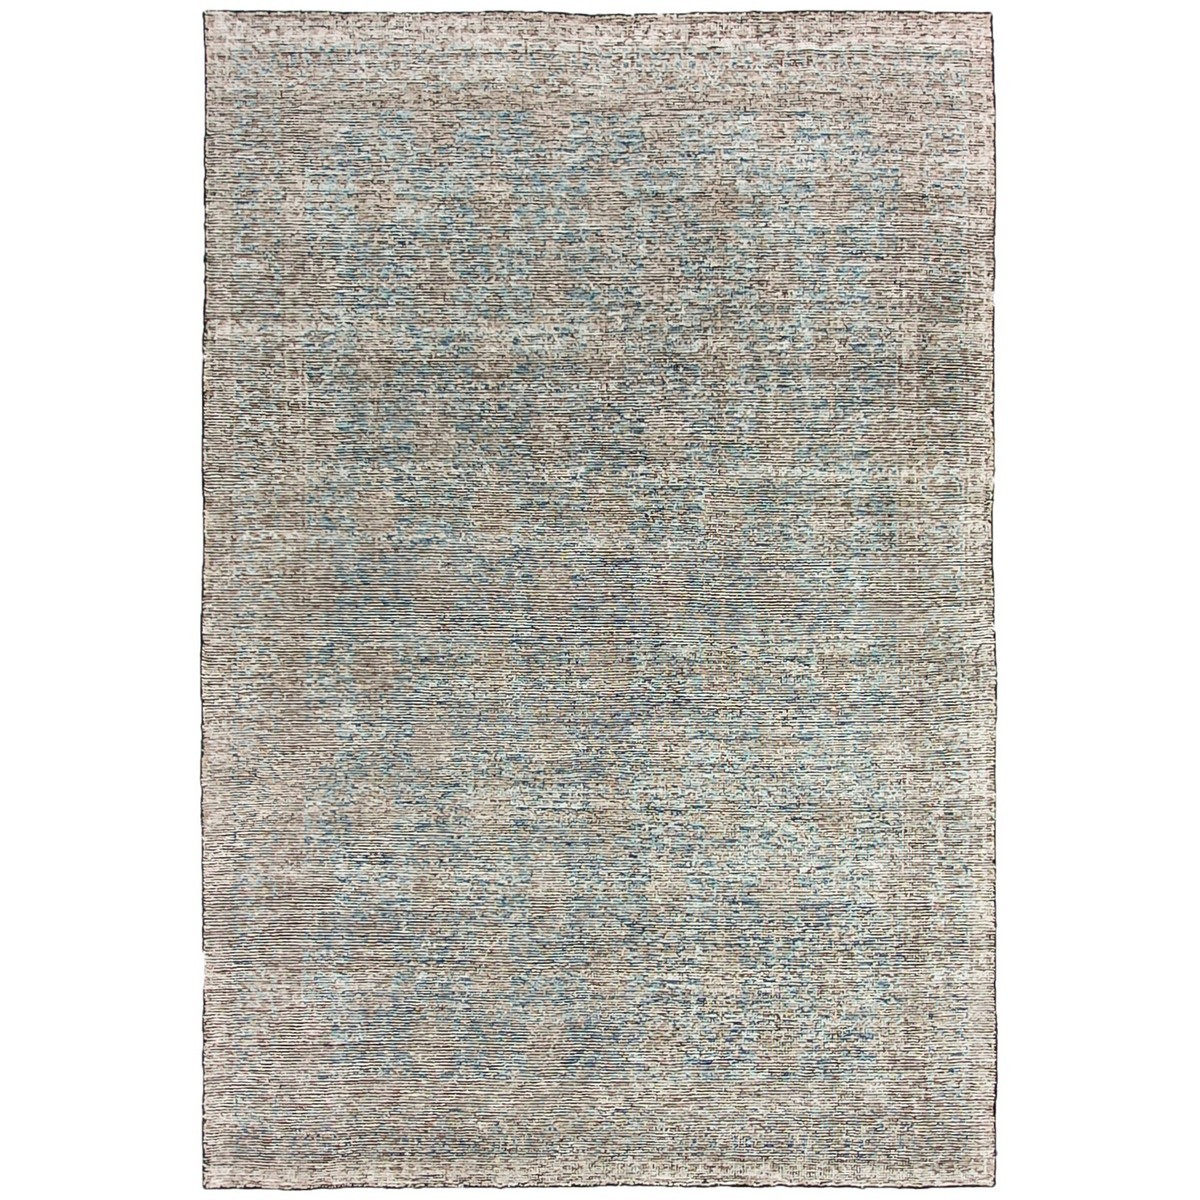 Revival Khotan Hand Knotted Wool & Viscose Rug, 250x350cm, Washed Indigo